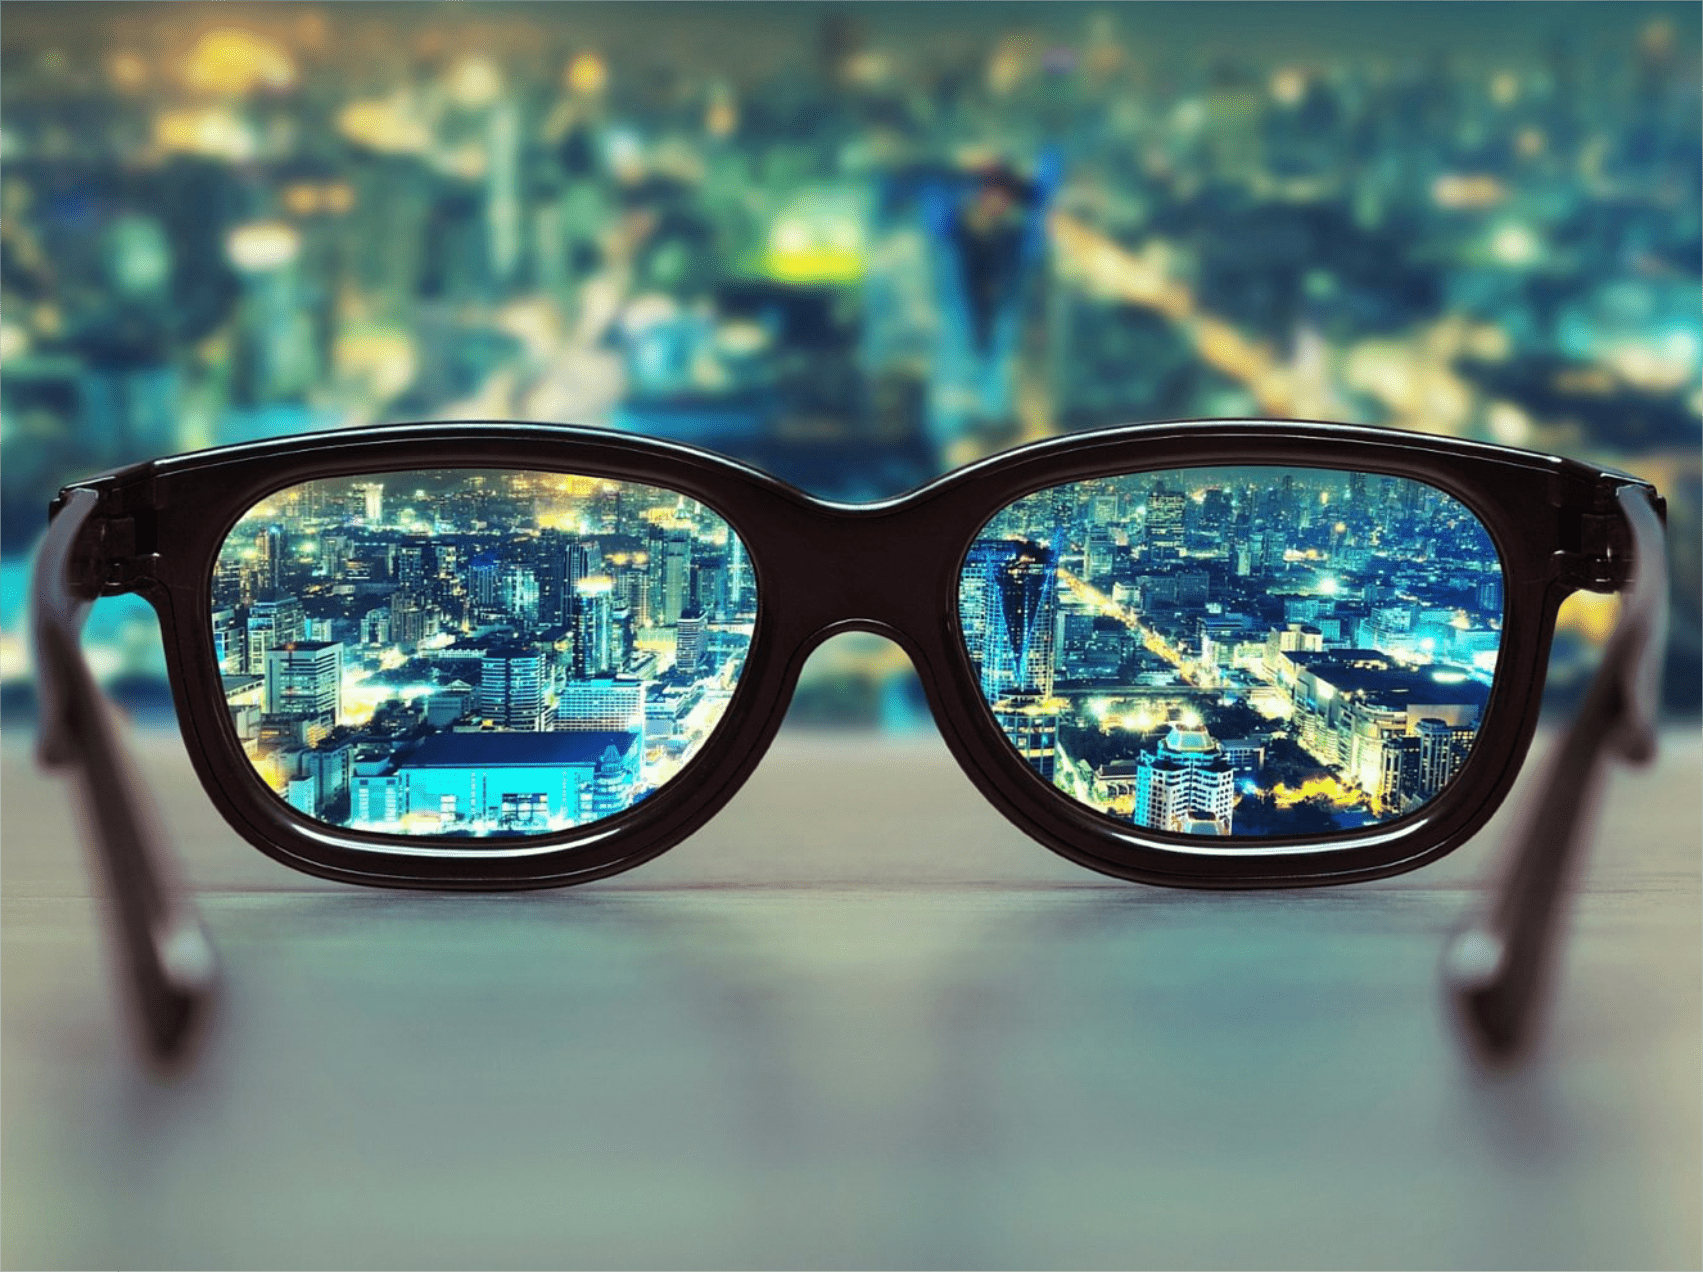 Экспресс-обследование перед автоматизацией. Как короткие 2 дня меняют взгляд на вещи?